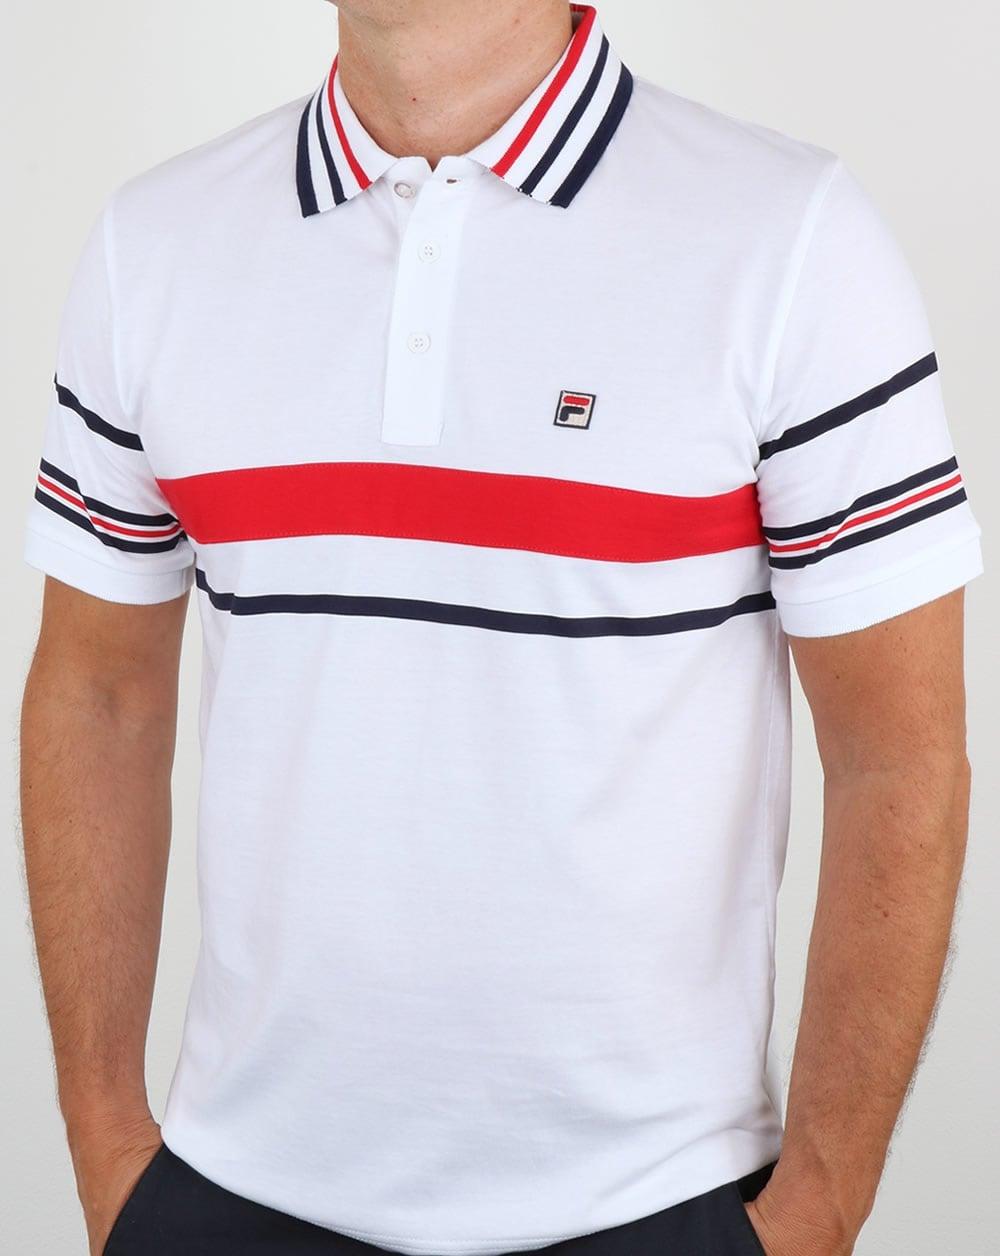 3bba207c88 Fila Vintage Bailer Polo Shirt White/Navy/Red,cotton,sports,retro,mens